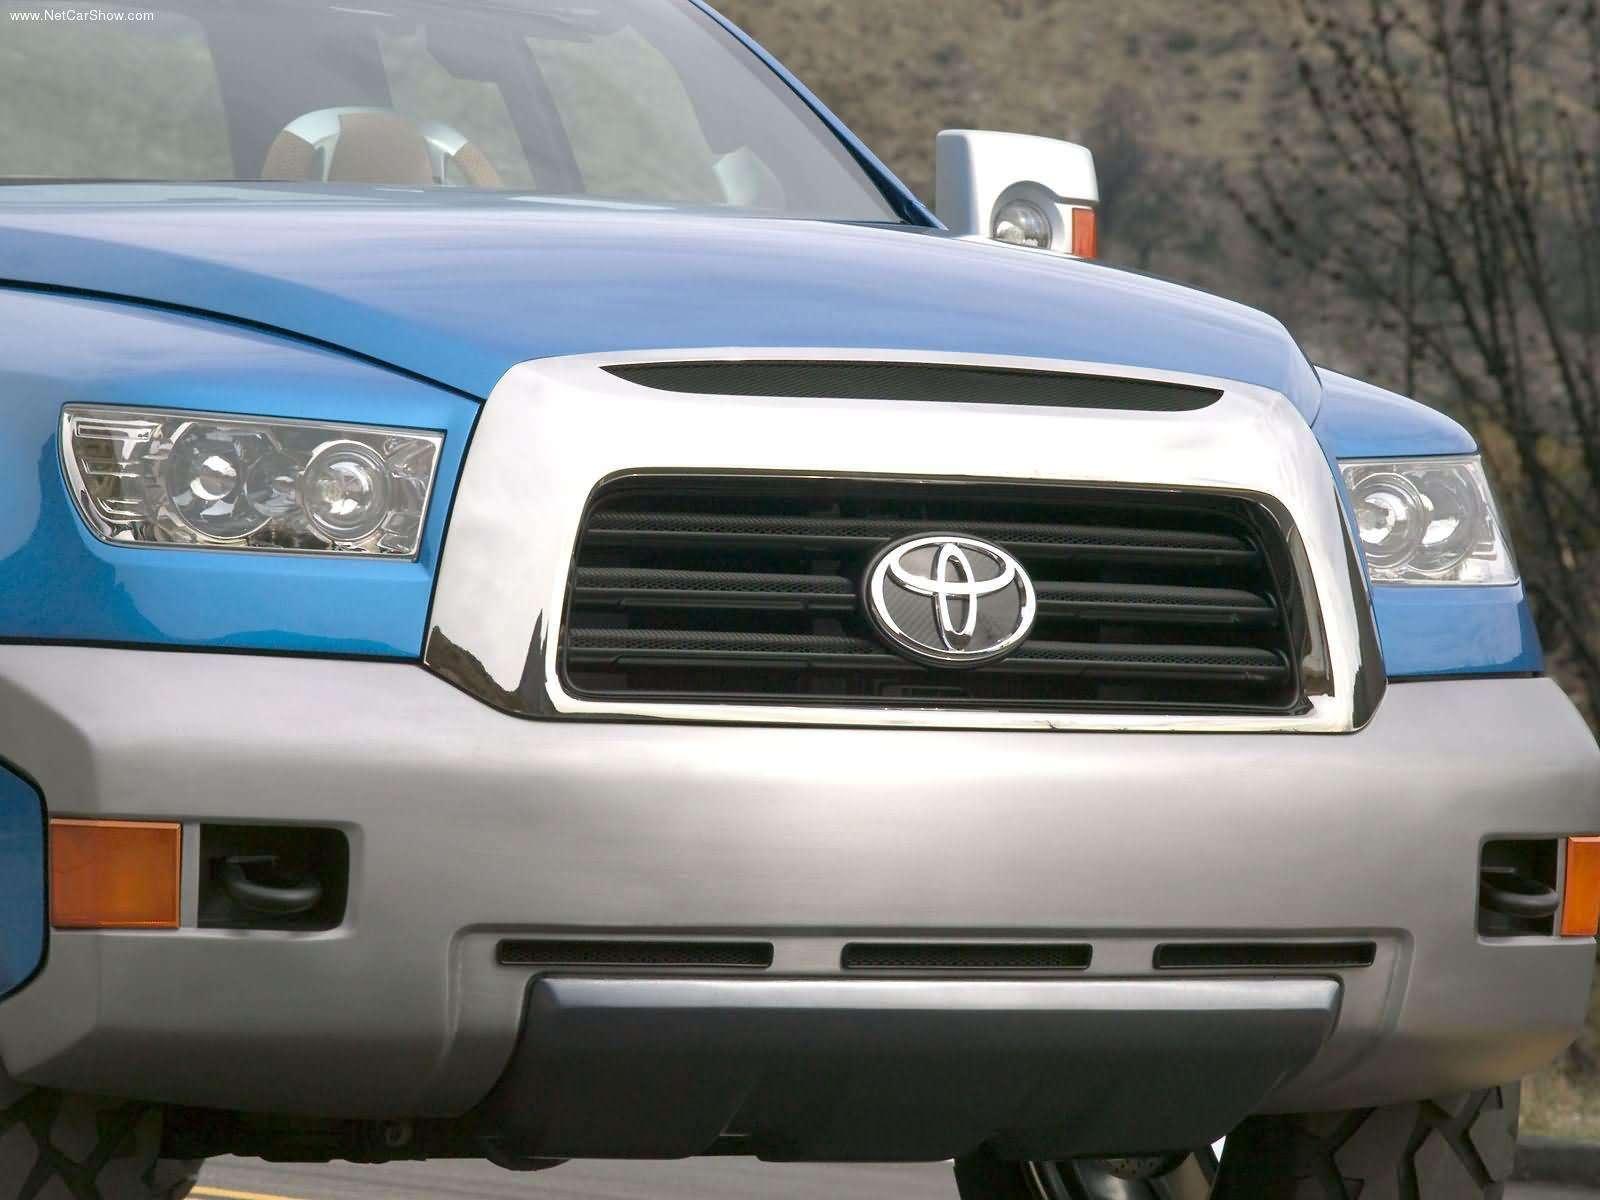 Toyota-FTX_Concept_2004_1600x1200_wallpaper_1f.jpg